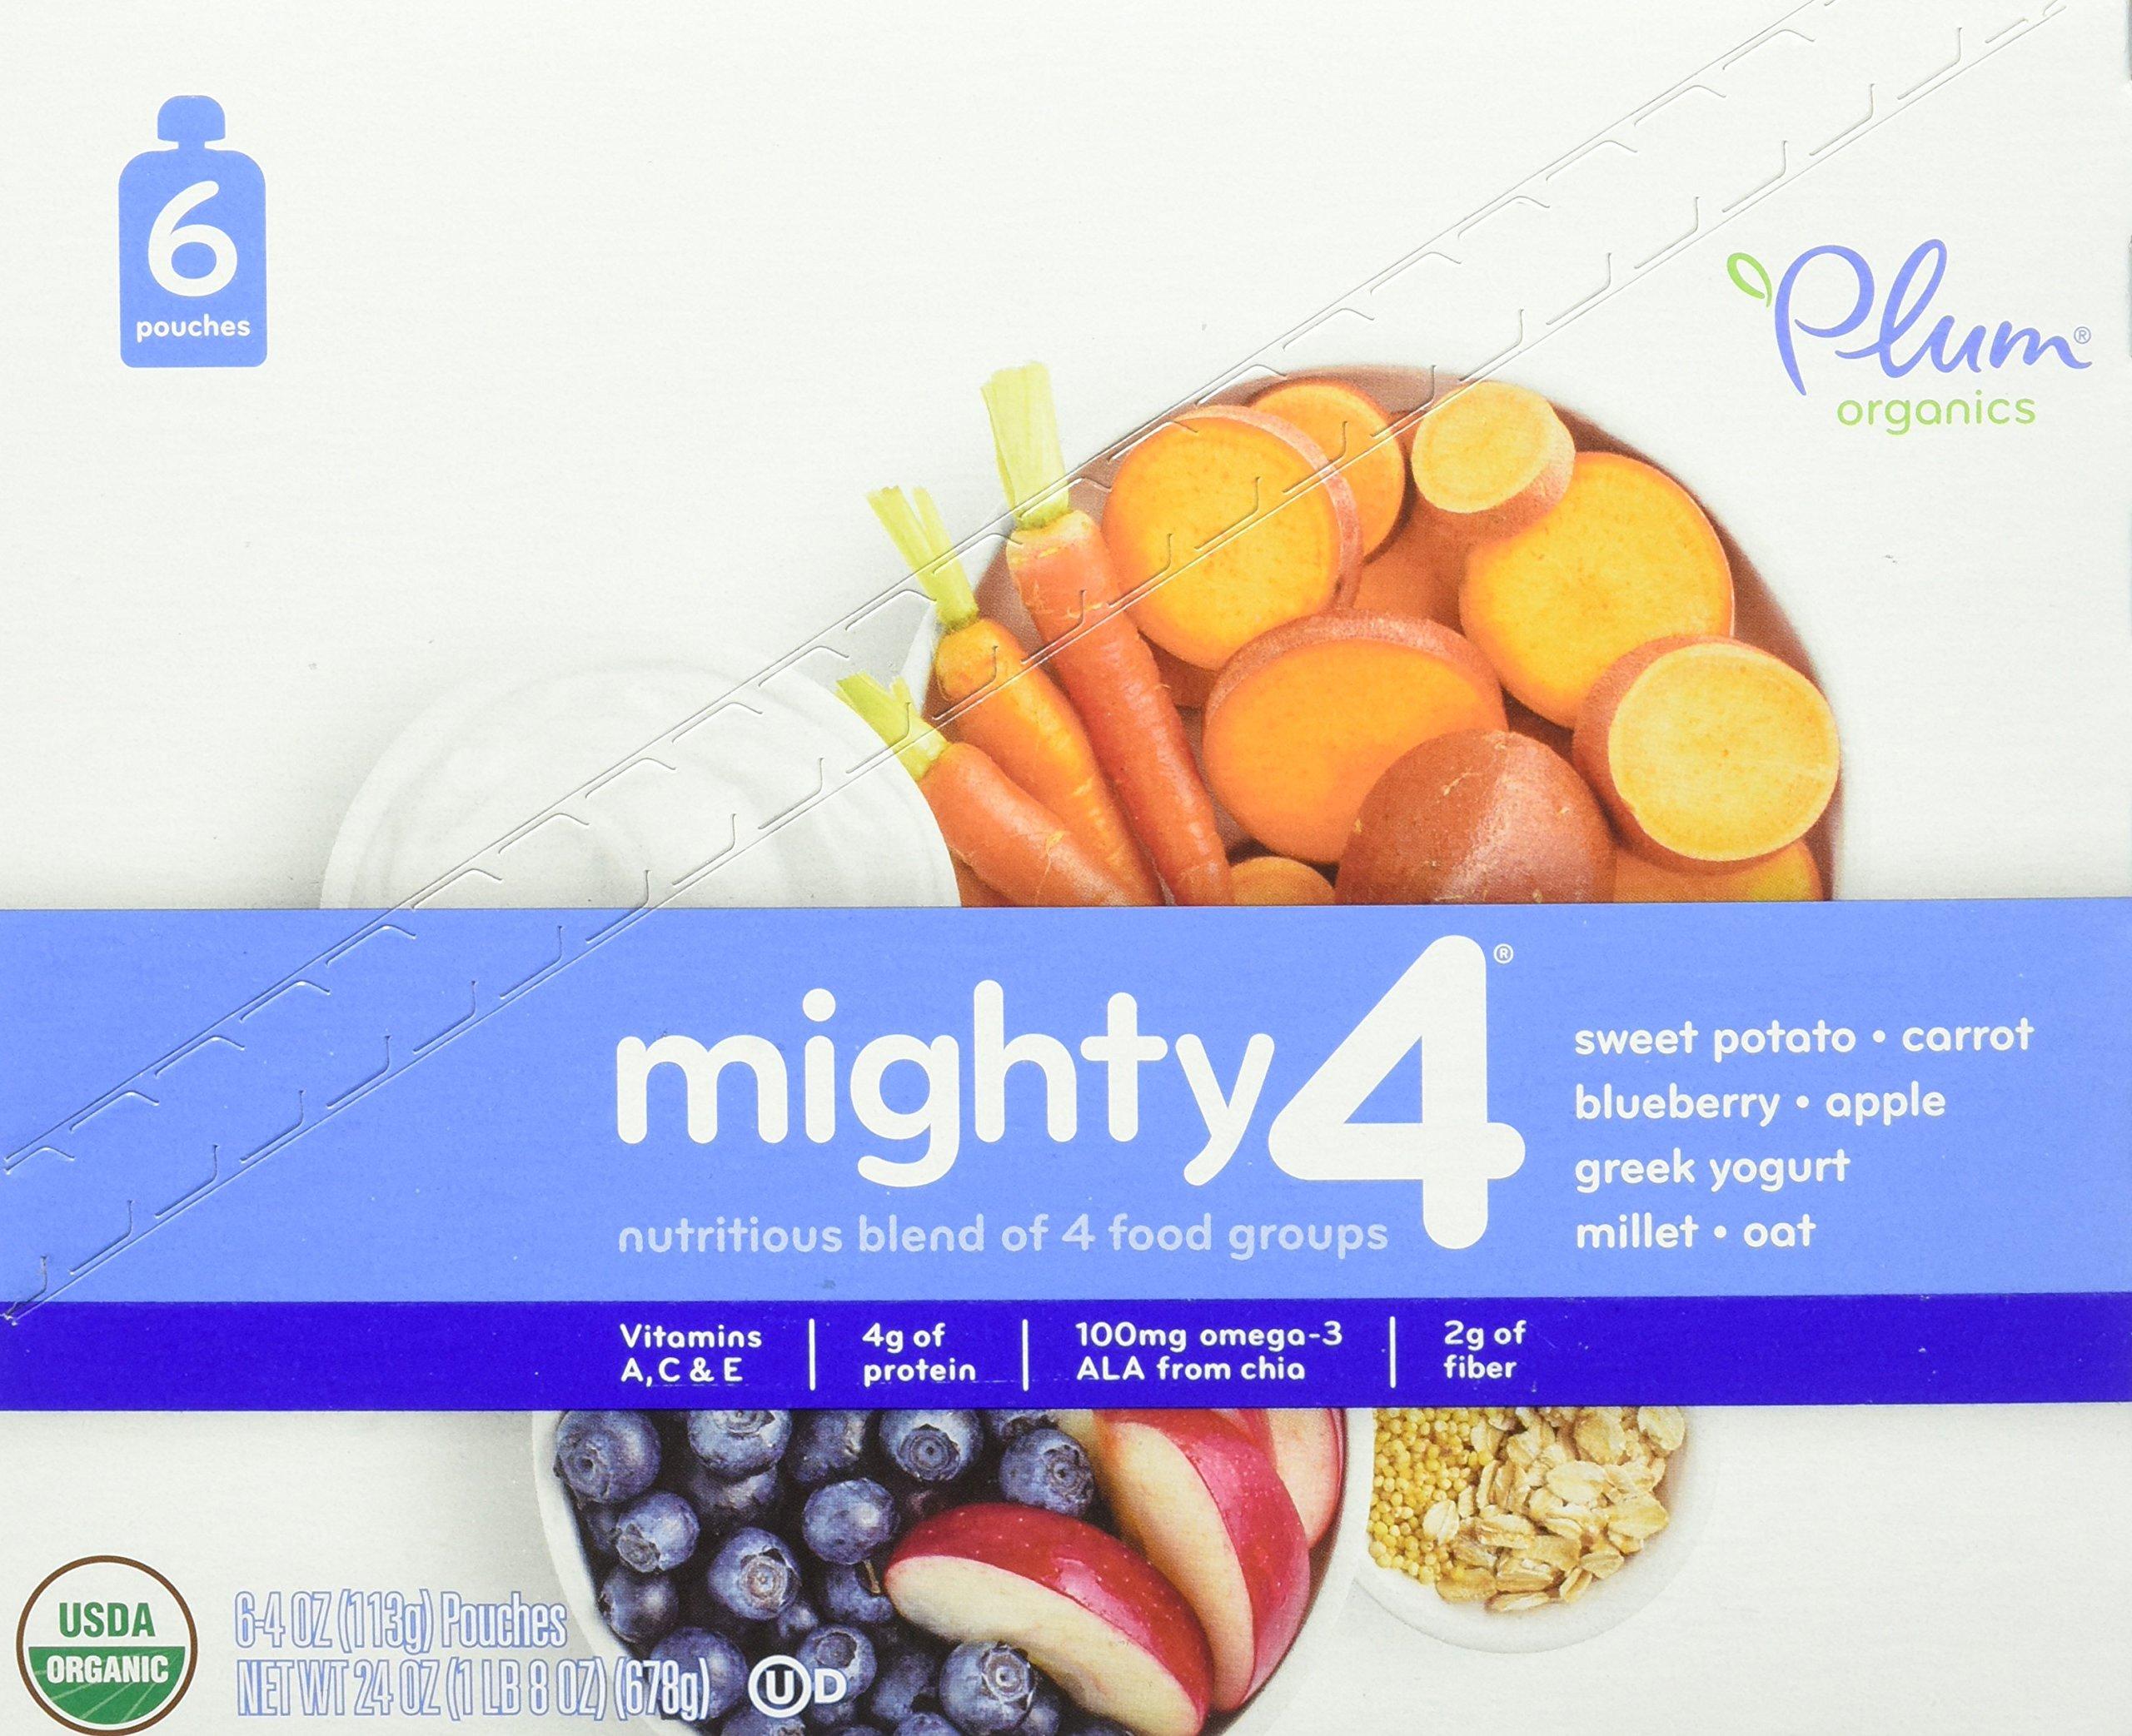 Plum Organics Mighty 4, Organic Toddler Food, Sweet Potato, Carrot, Blueberry, Apple, Greek Yogurt, Millet & Oat, 4 ounce pouch (Pack of 12)